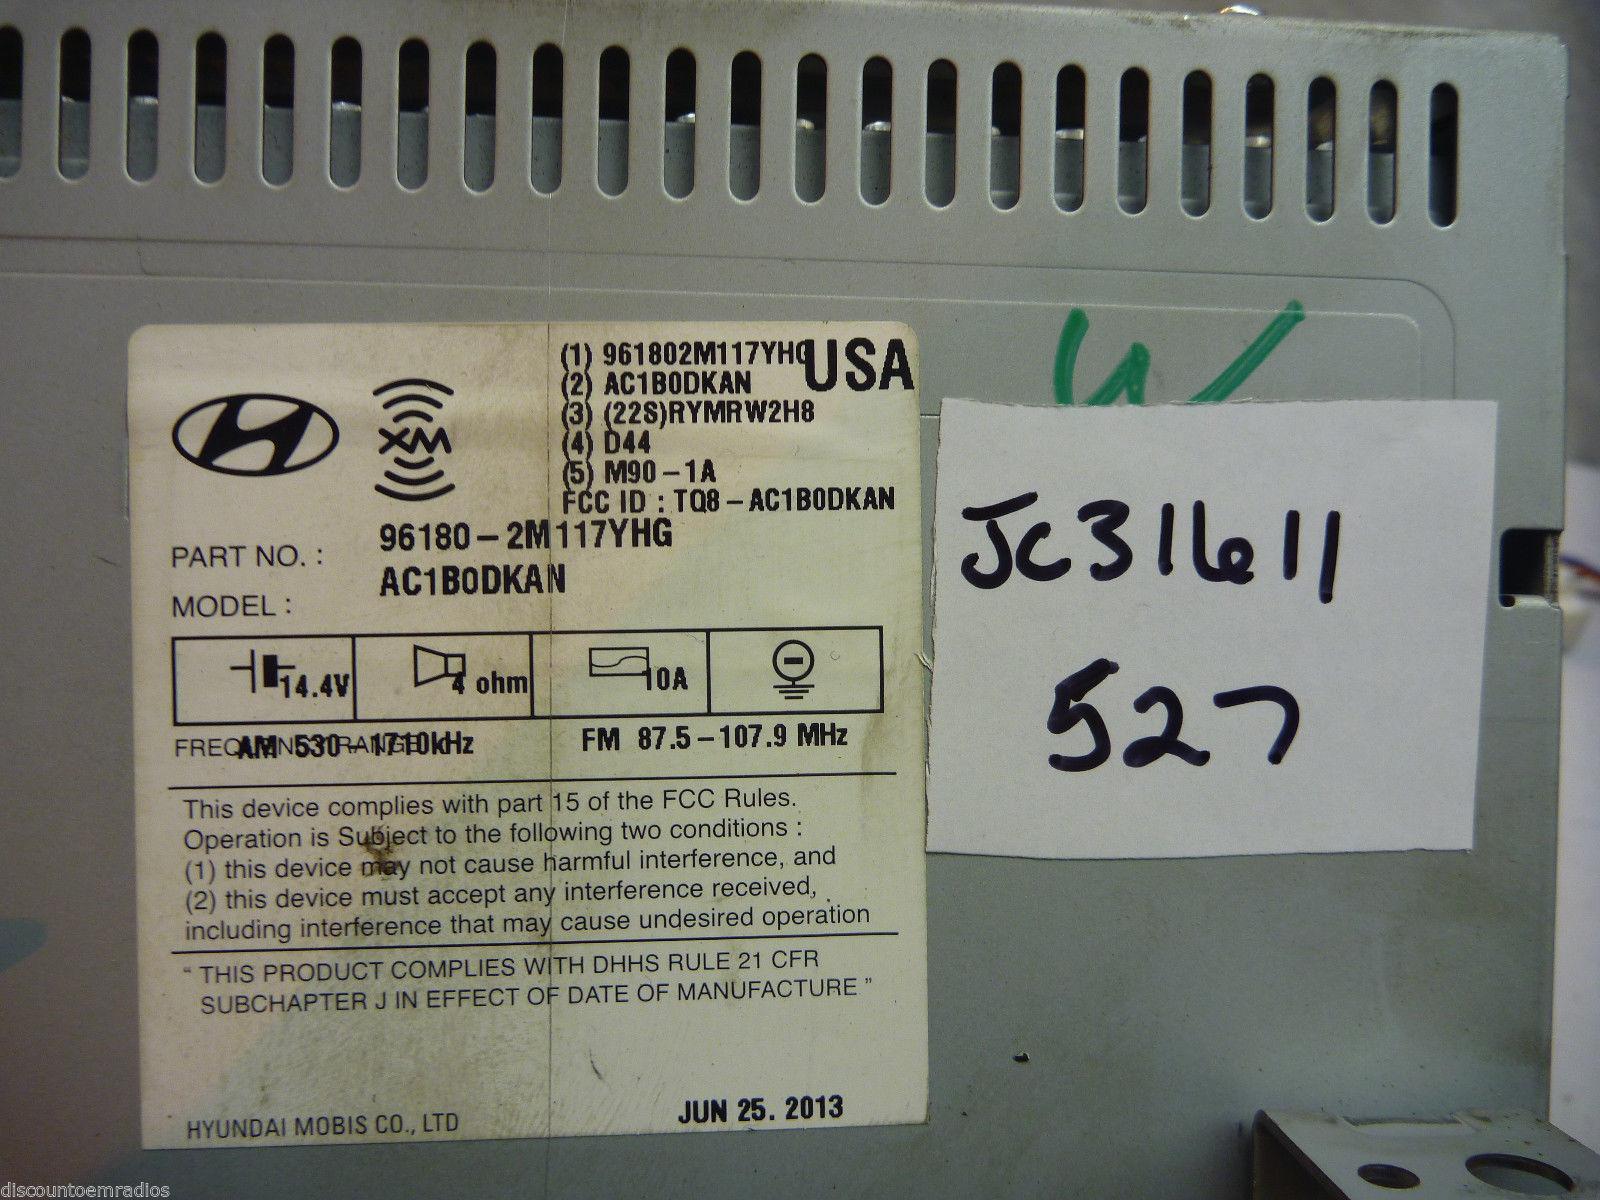 13 2013  Hyundai Genesis Radio Cd Player Mp3 Player 96180-2M117YHG  JC31611